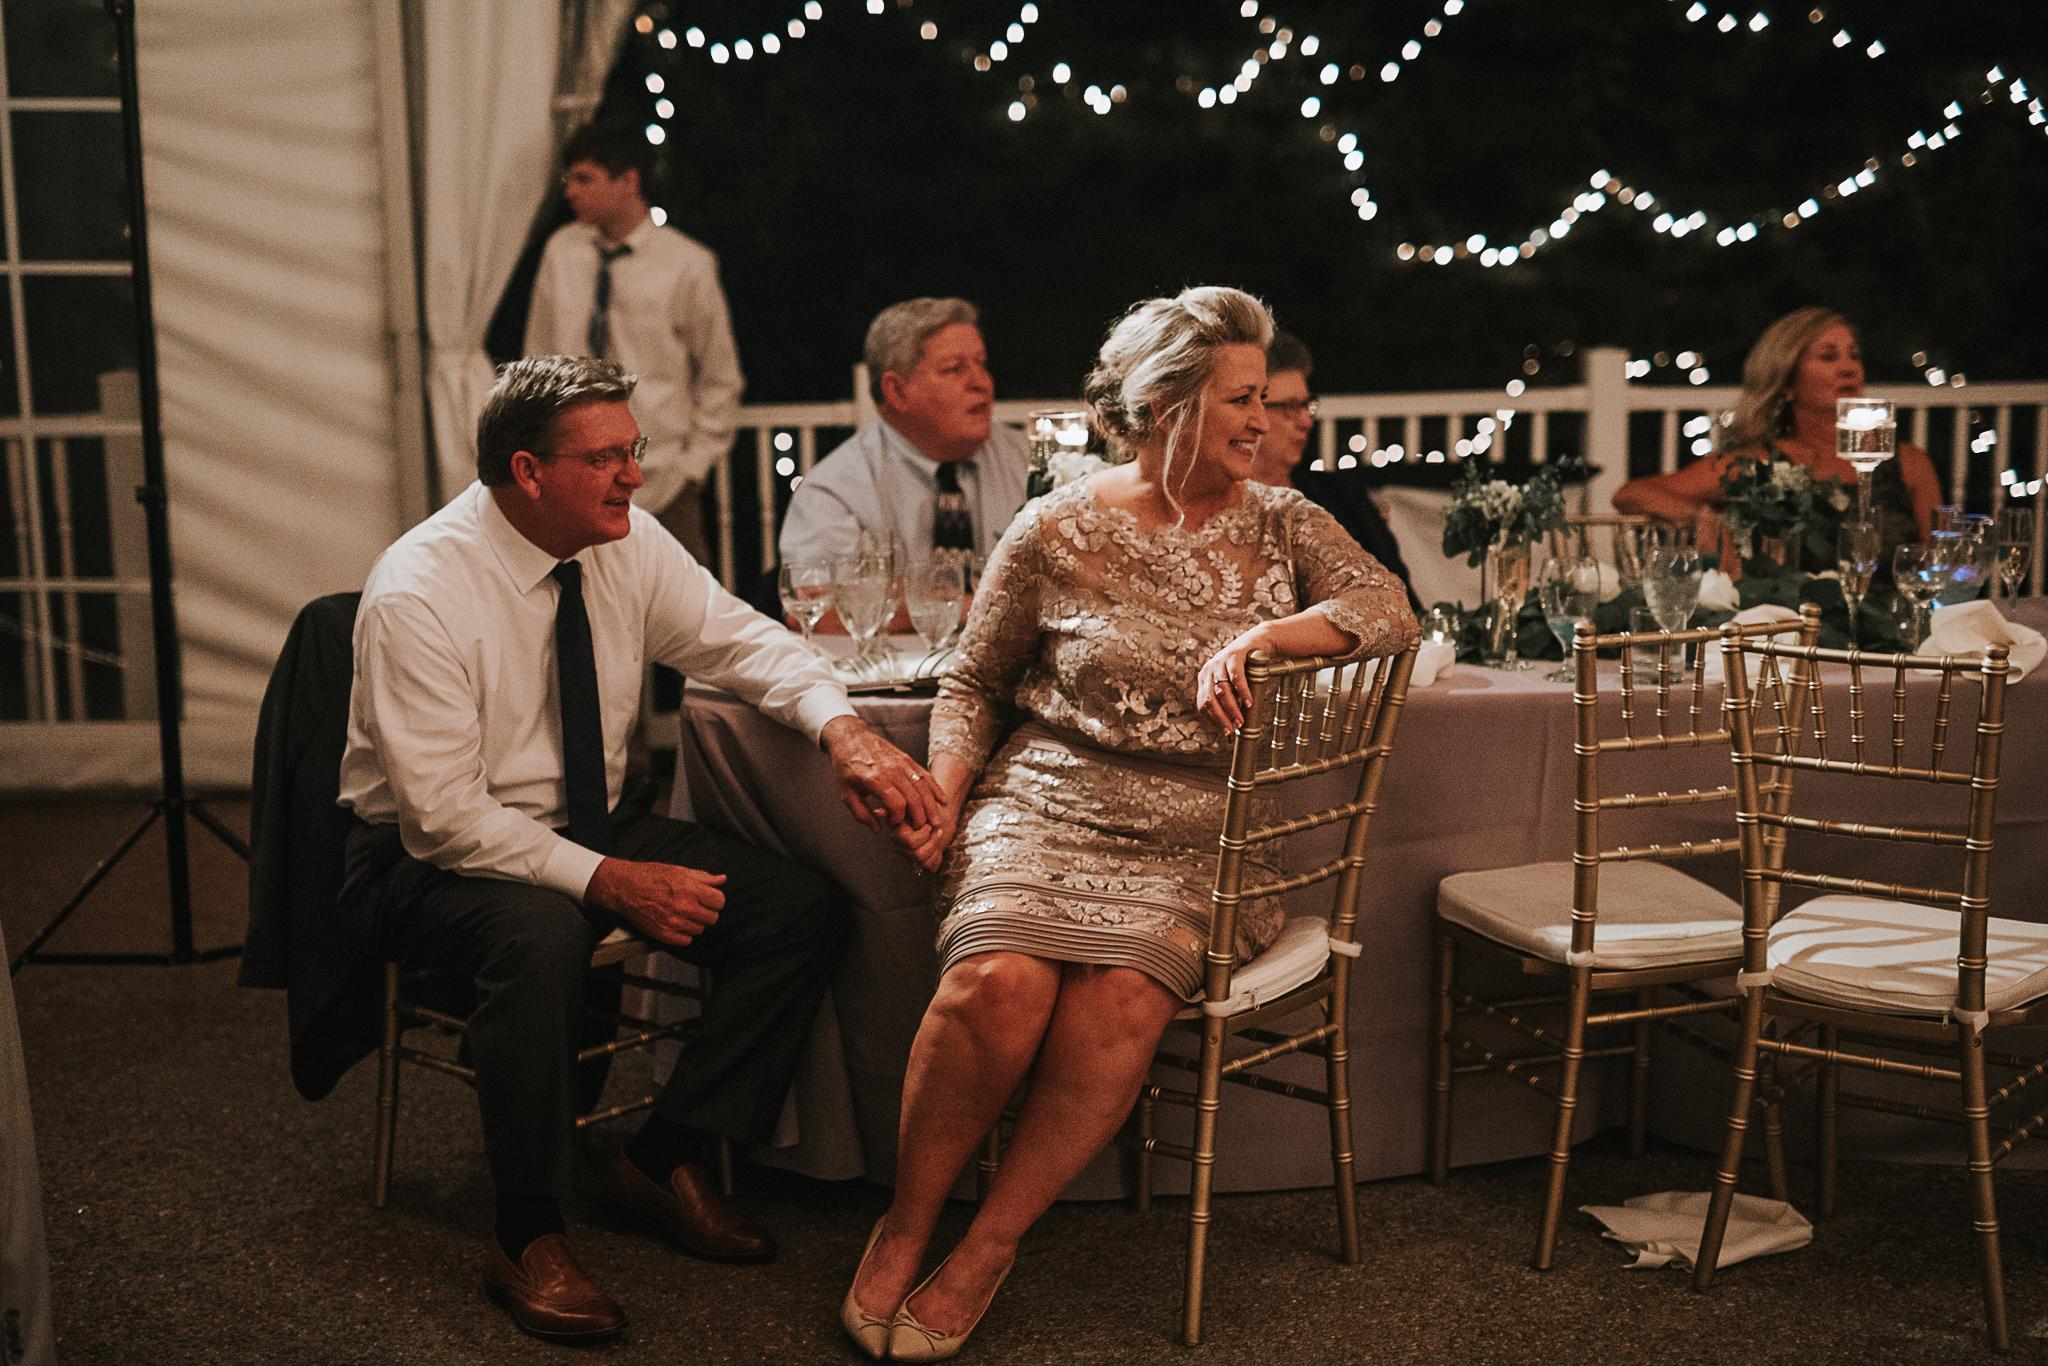 riverwood-mansion-wedding-photos-nashville-tn-5.jpg